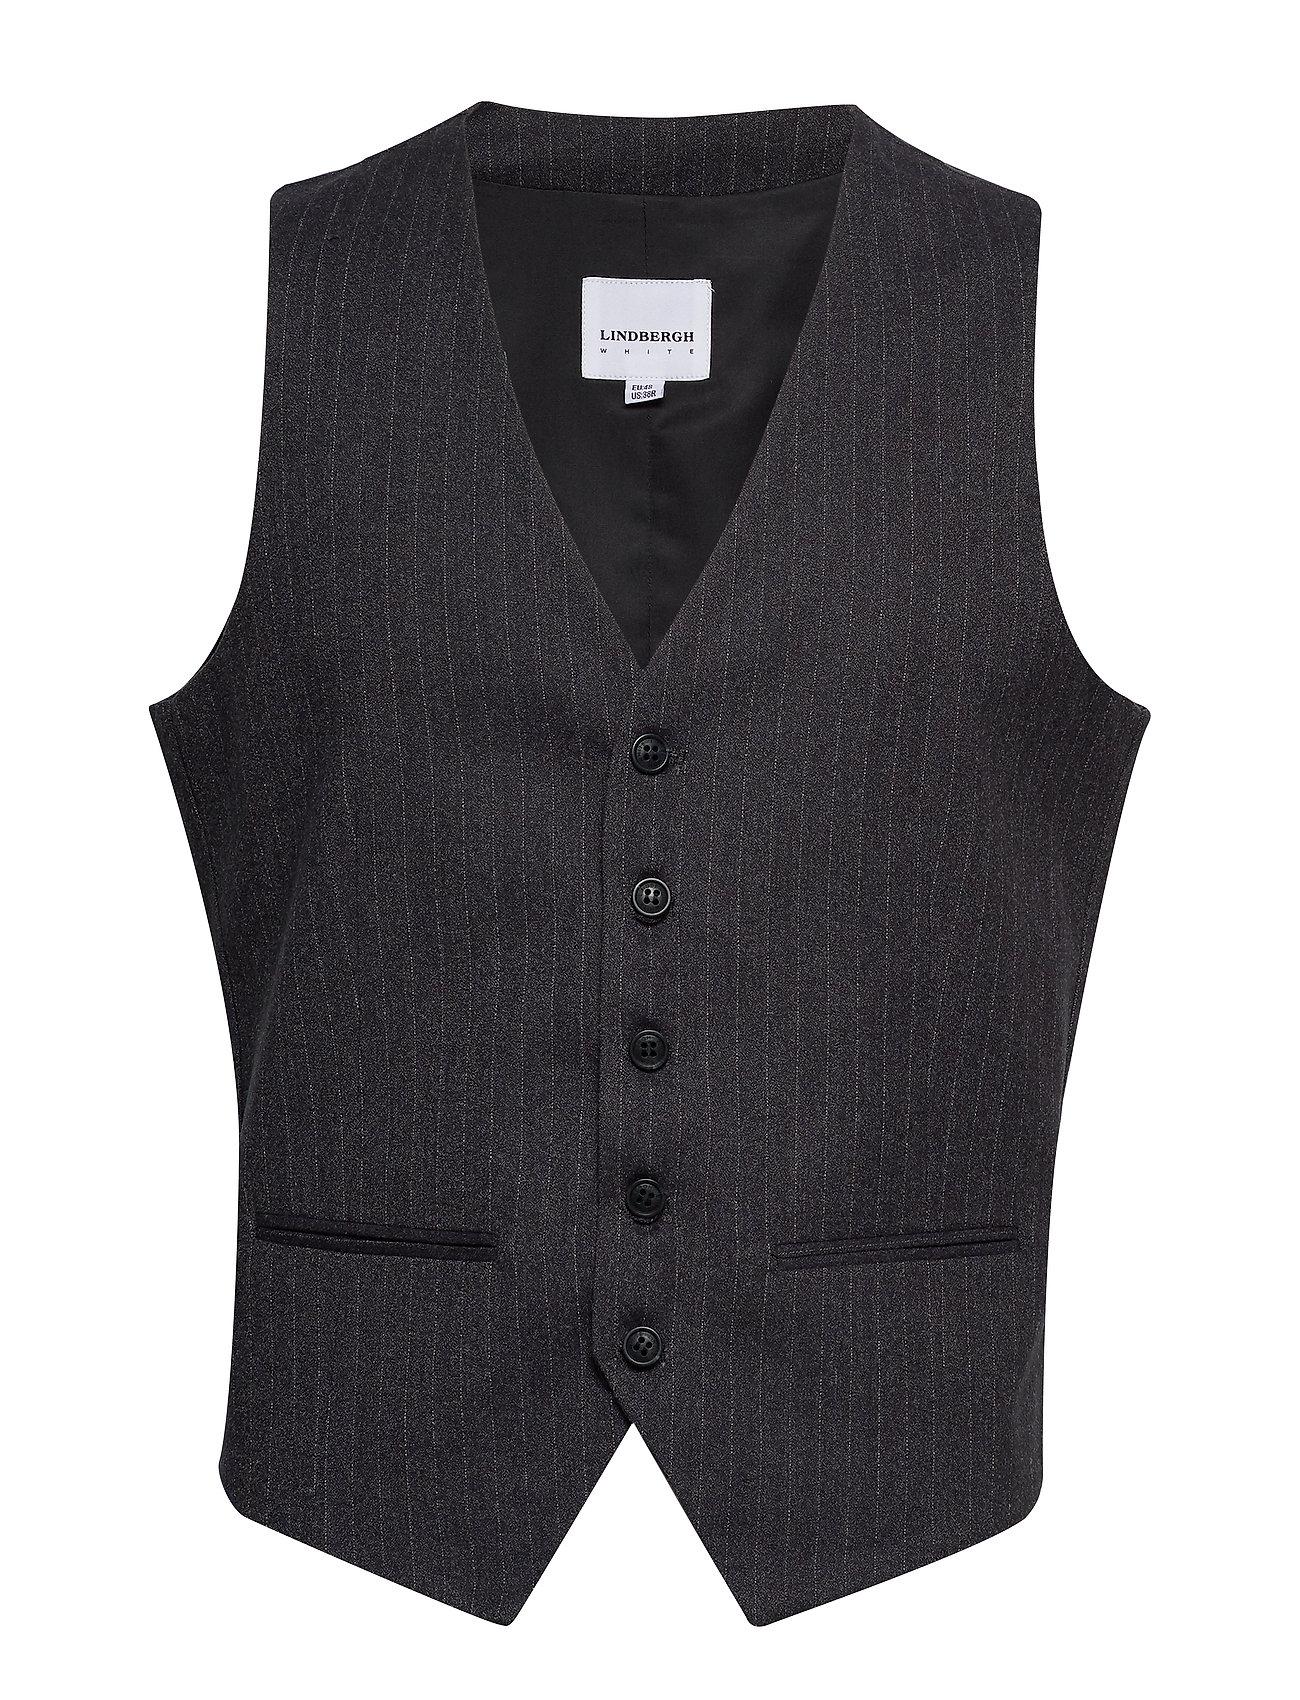 Lindbergh Pin striped waistcoat - DK GREY MEL